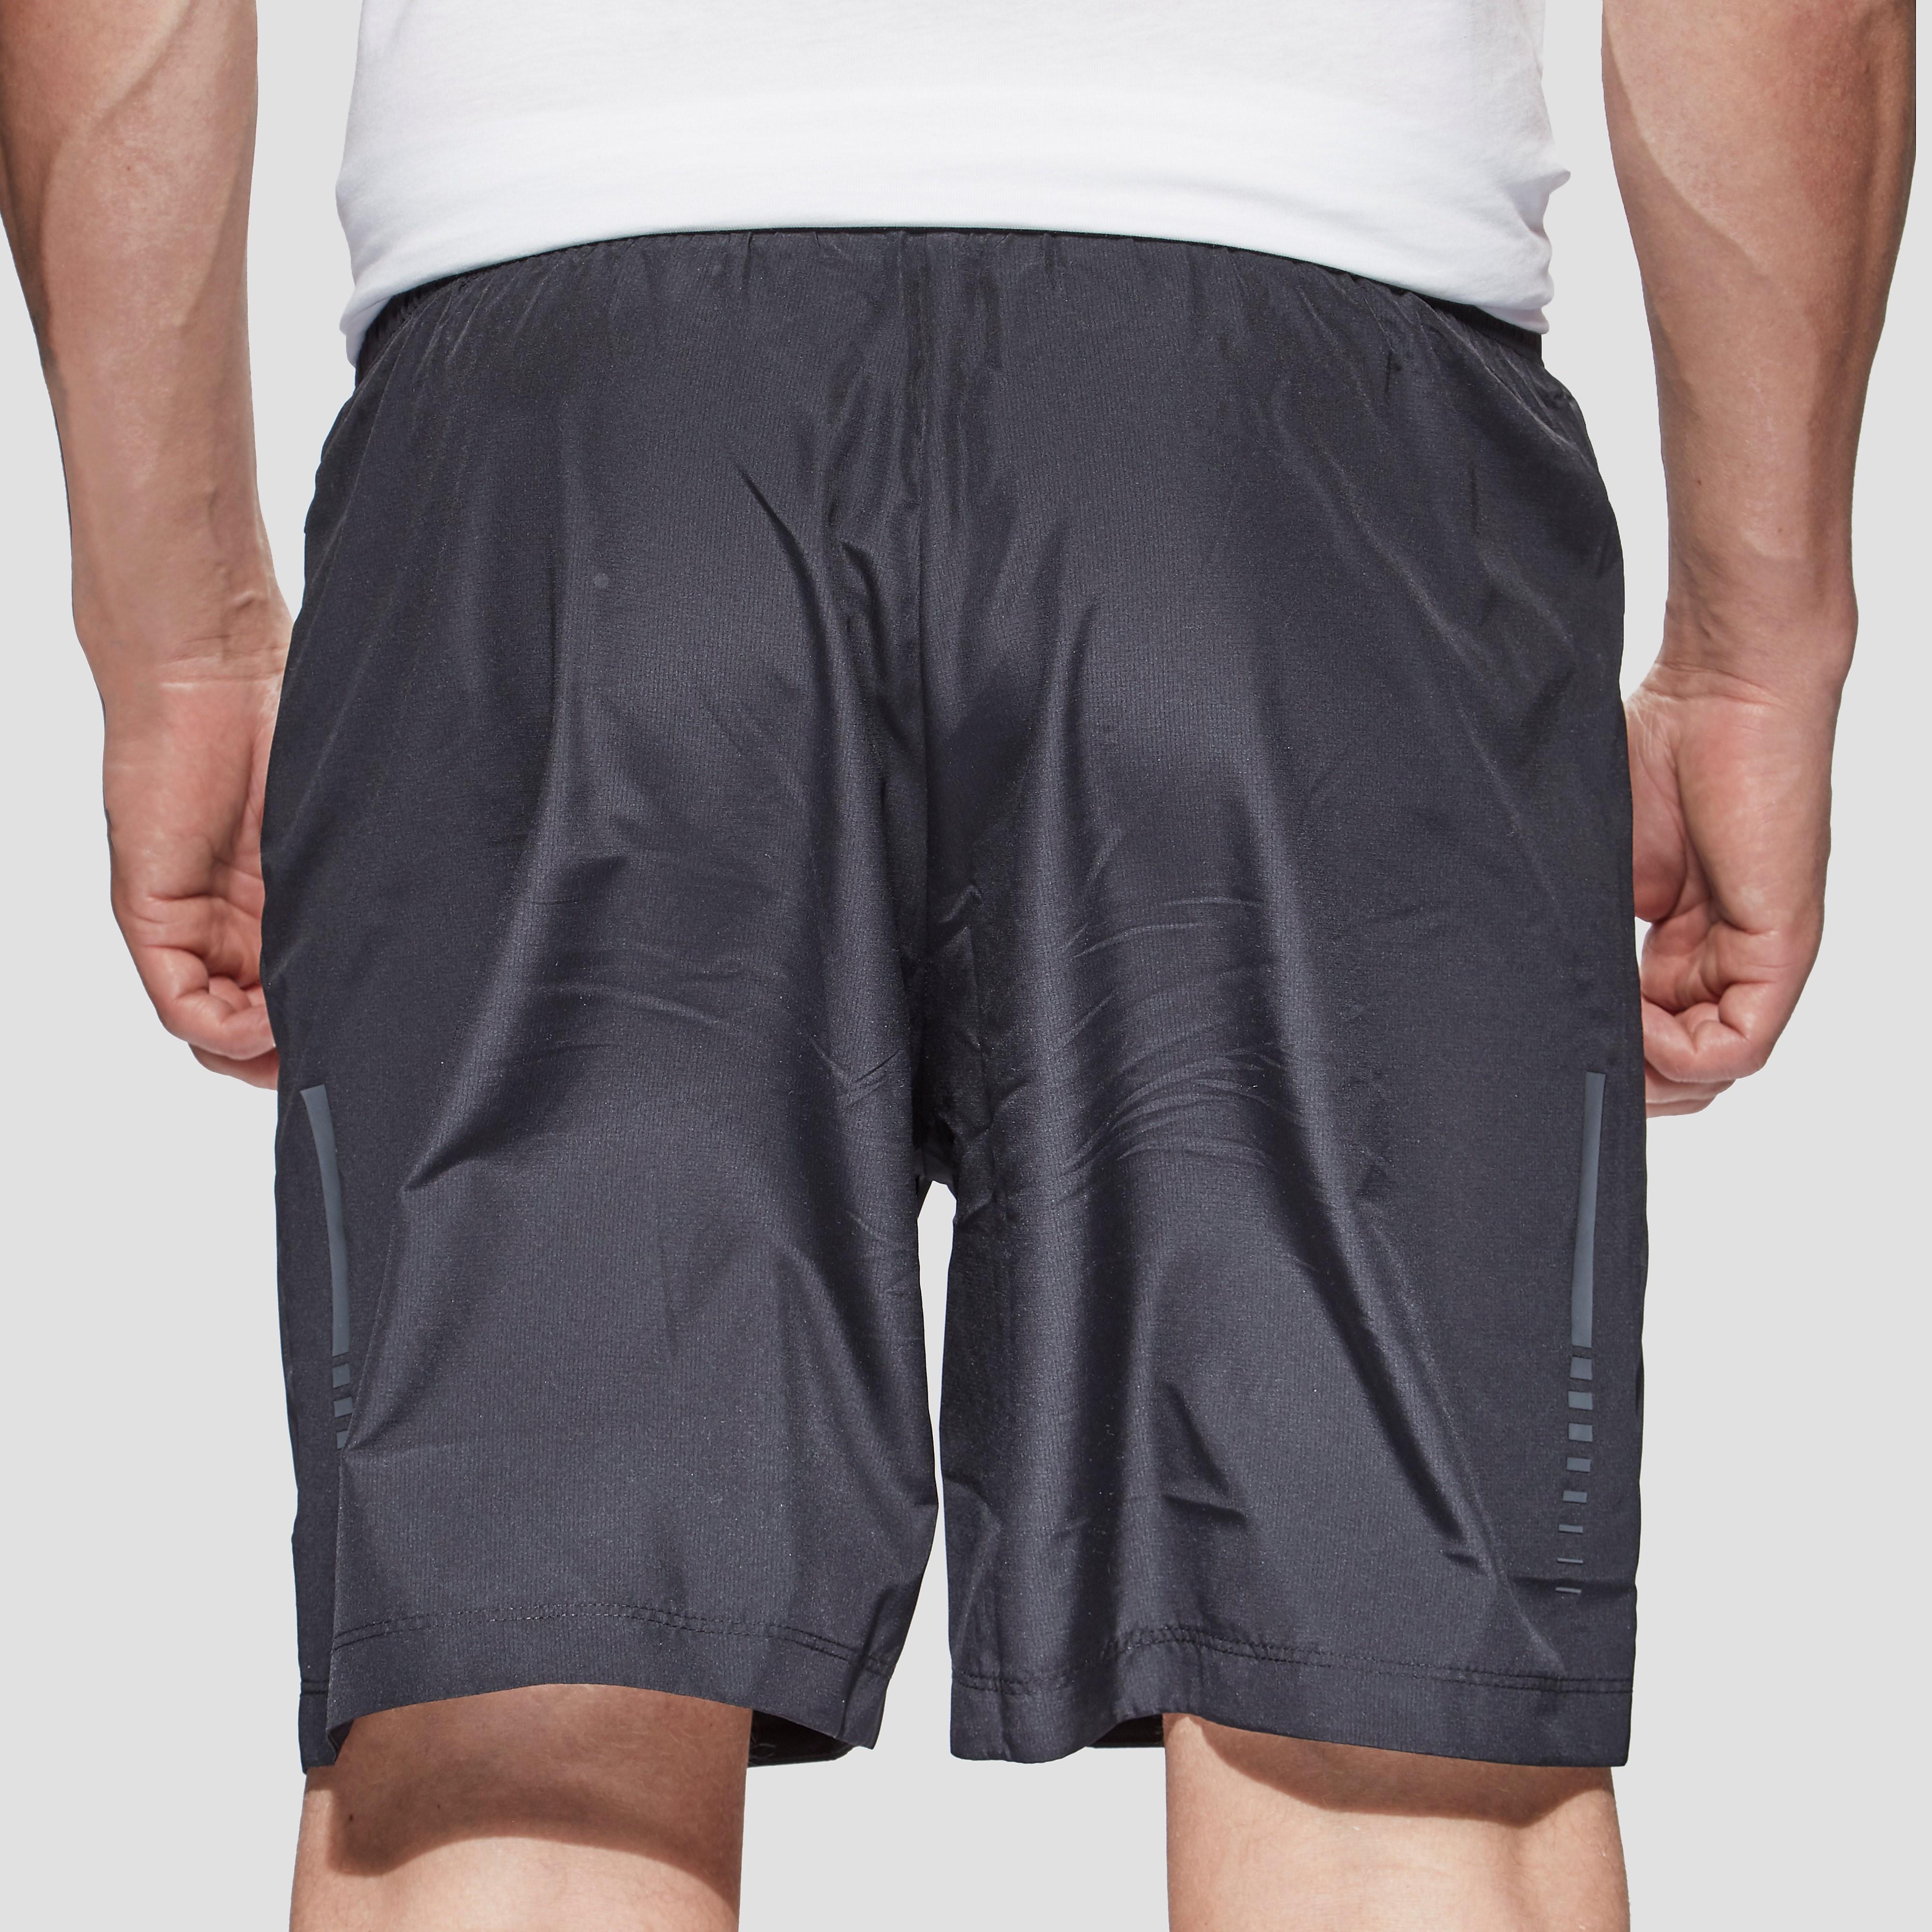 ASICS Men's 7 Inch Running Shorts